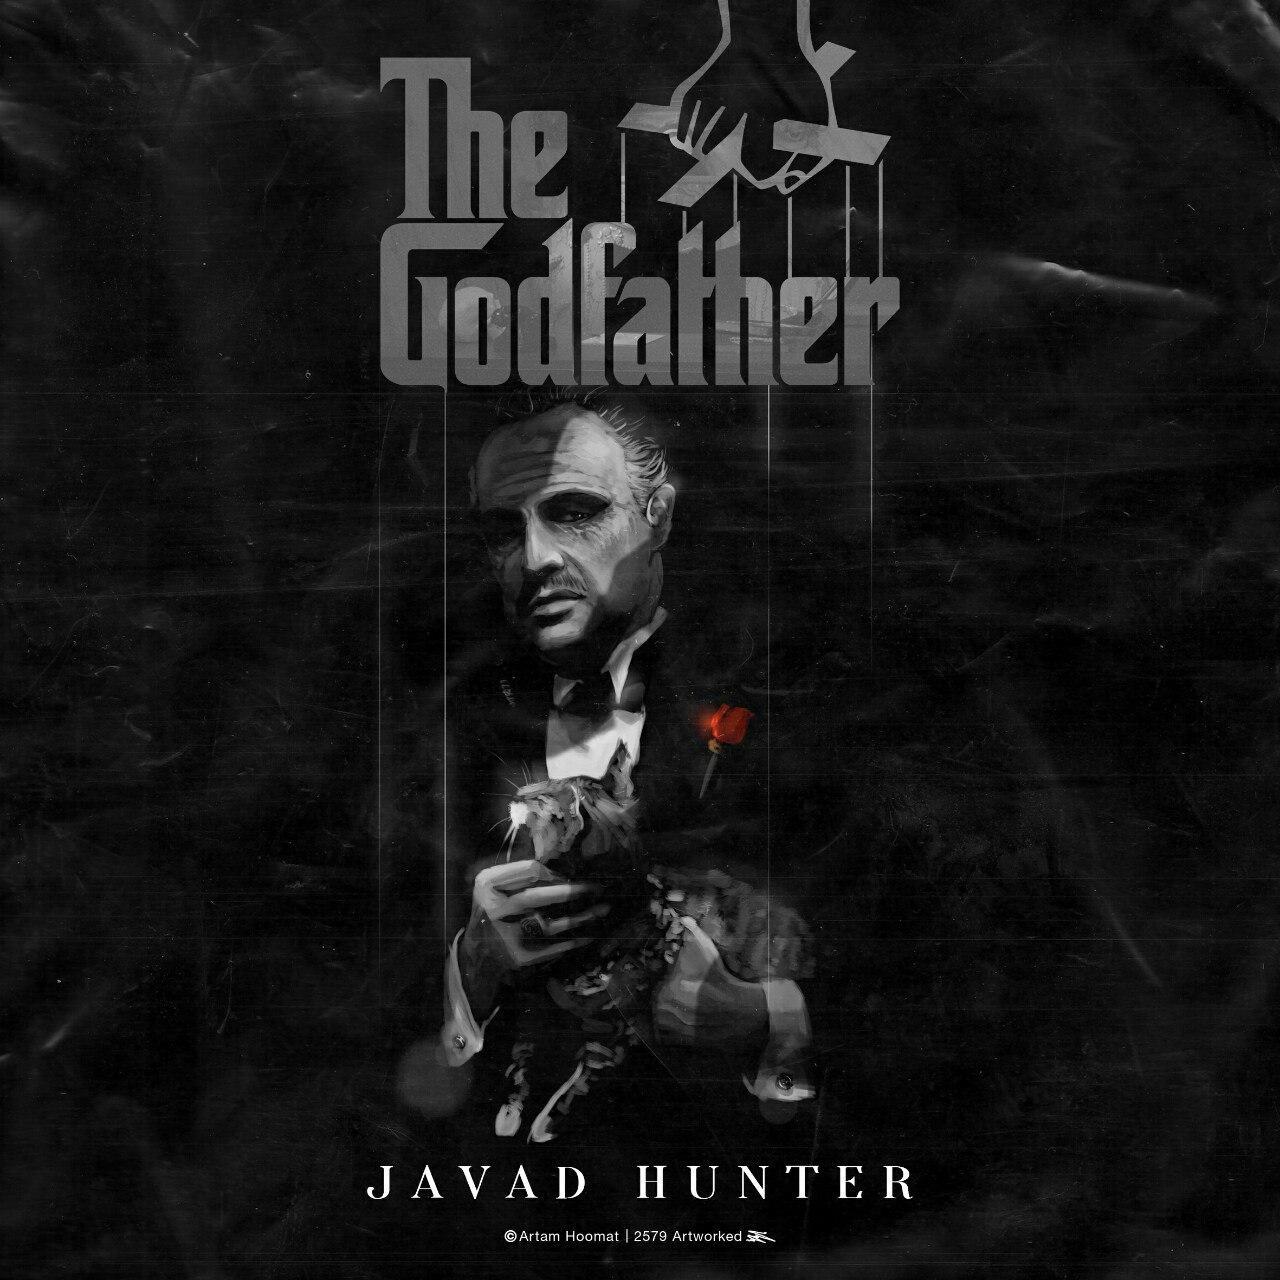 Javad Hunter – The God Father